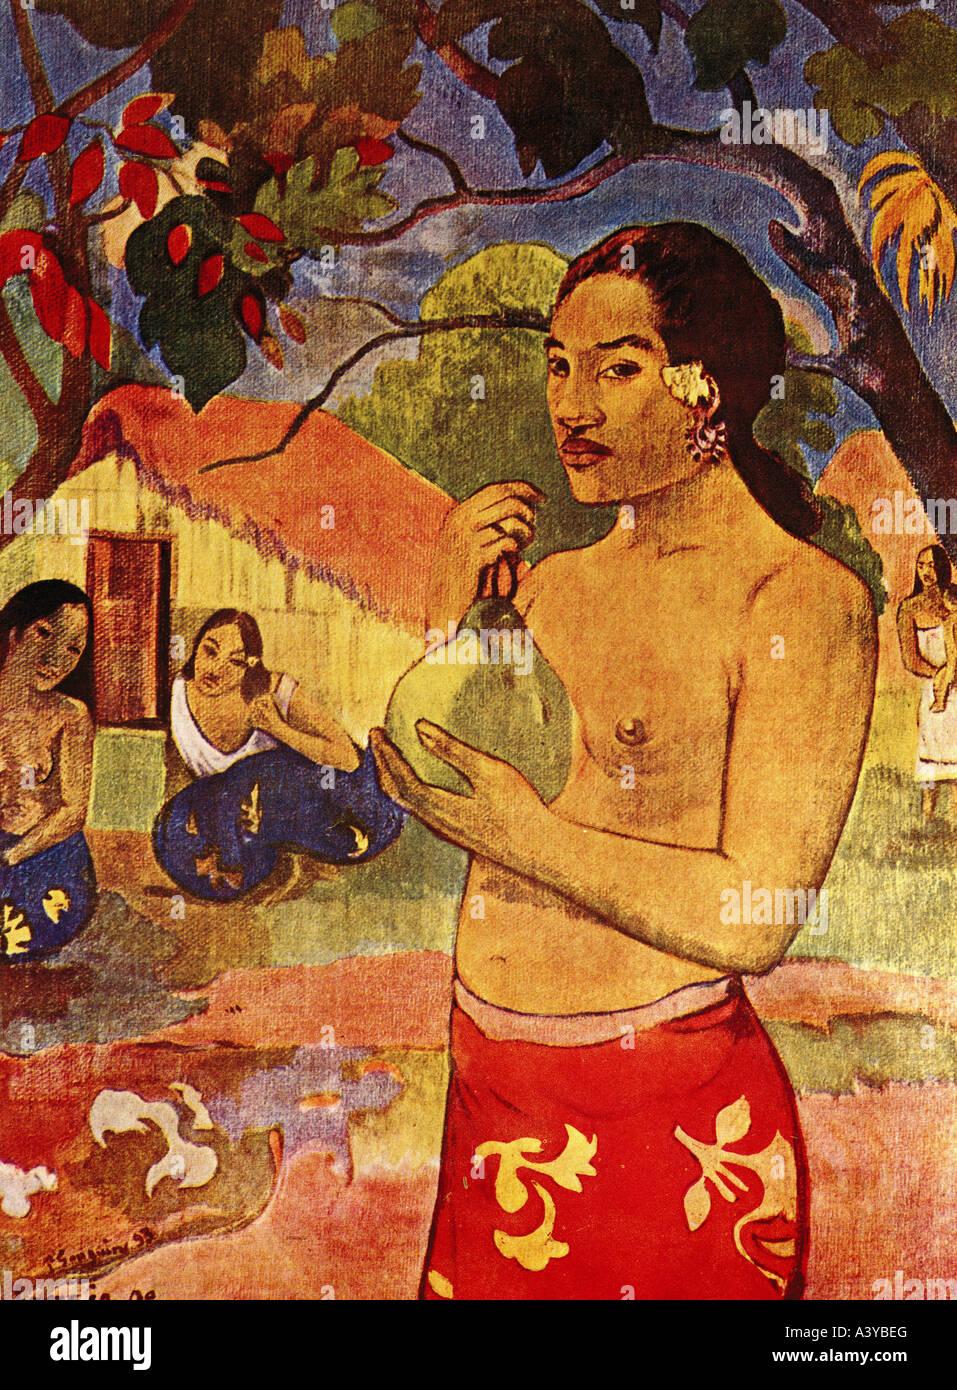 """fine arts, Gauguin, Paul, (1848 - 1903), painting, ""Tahiti woman with fruit"", 1893, oil on canvas, Puschkin museum, Stock Photo"